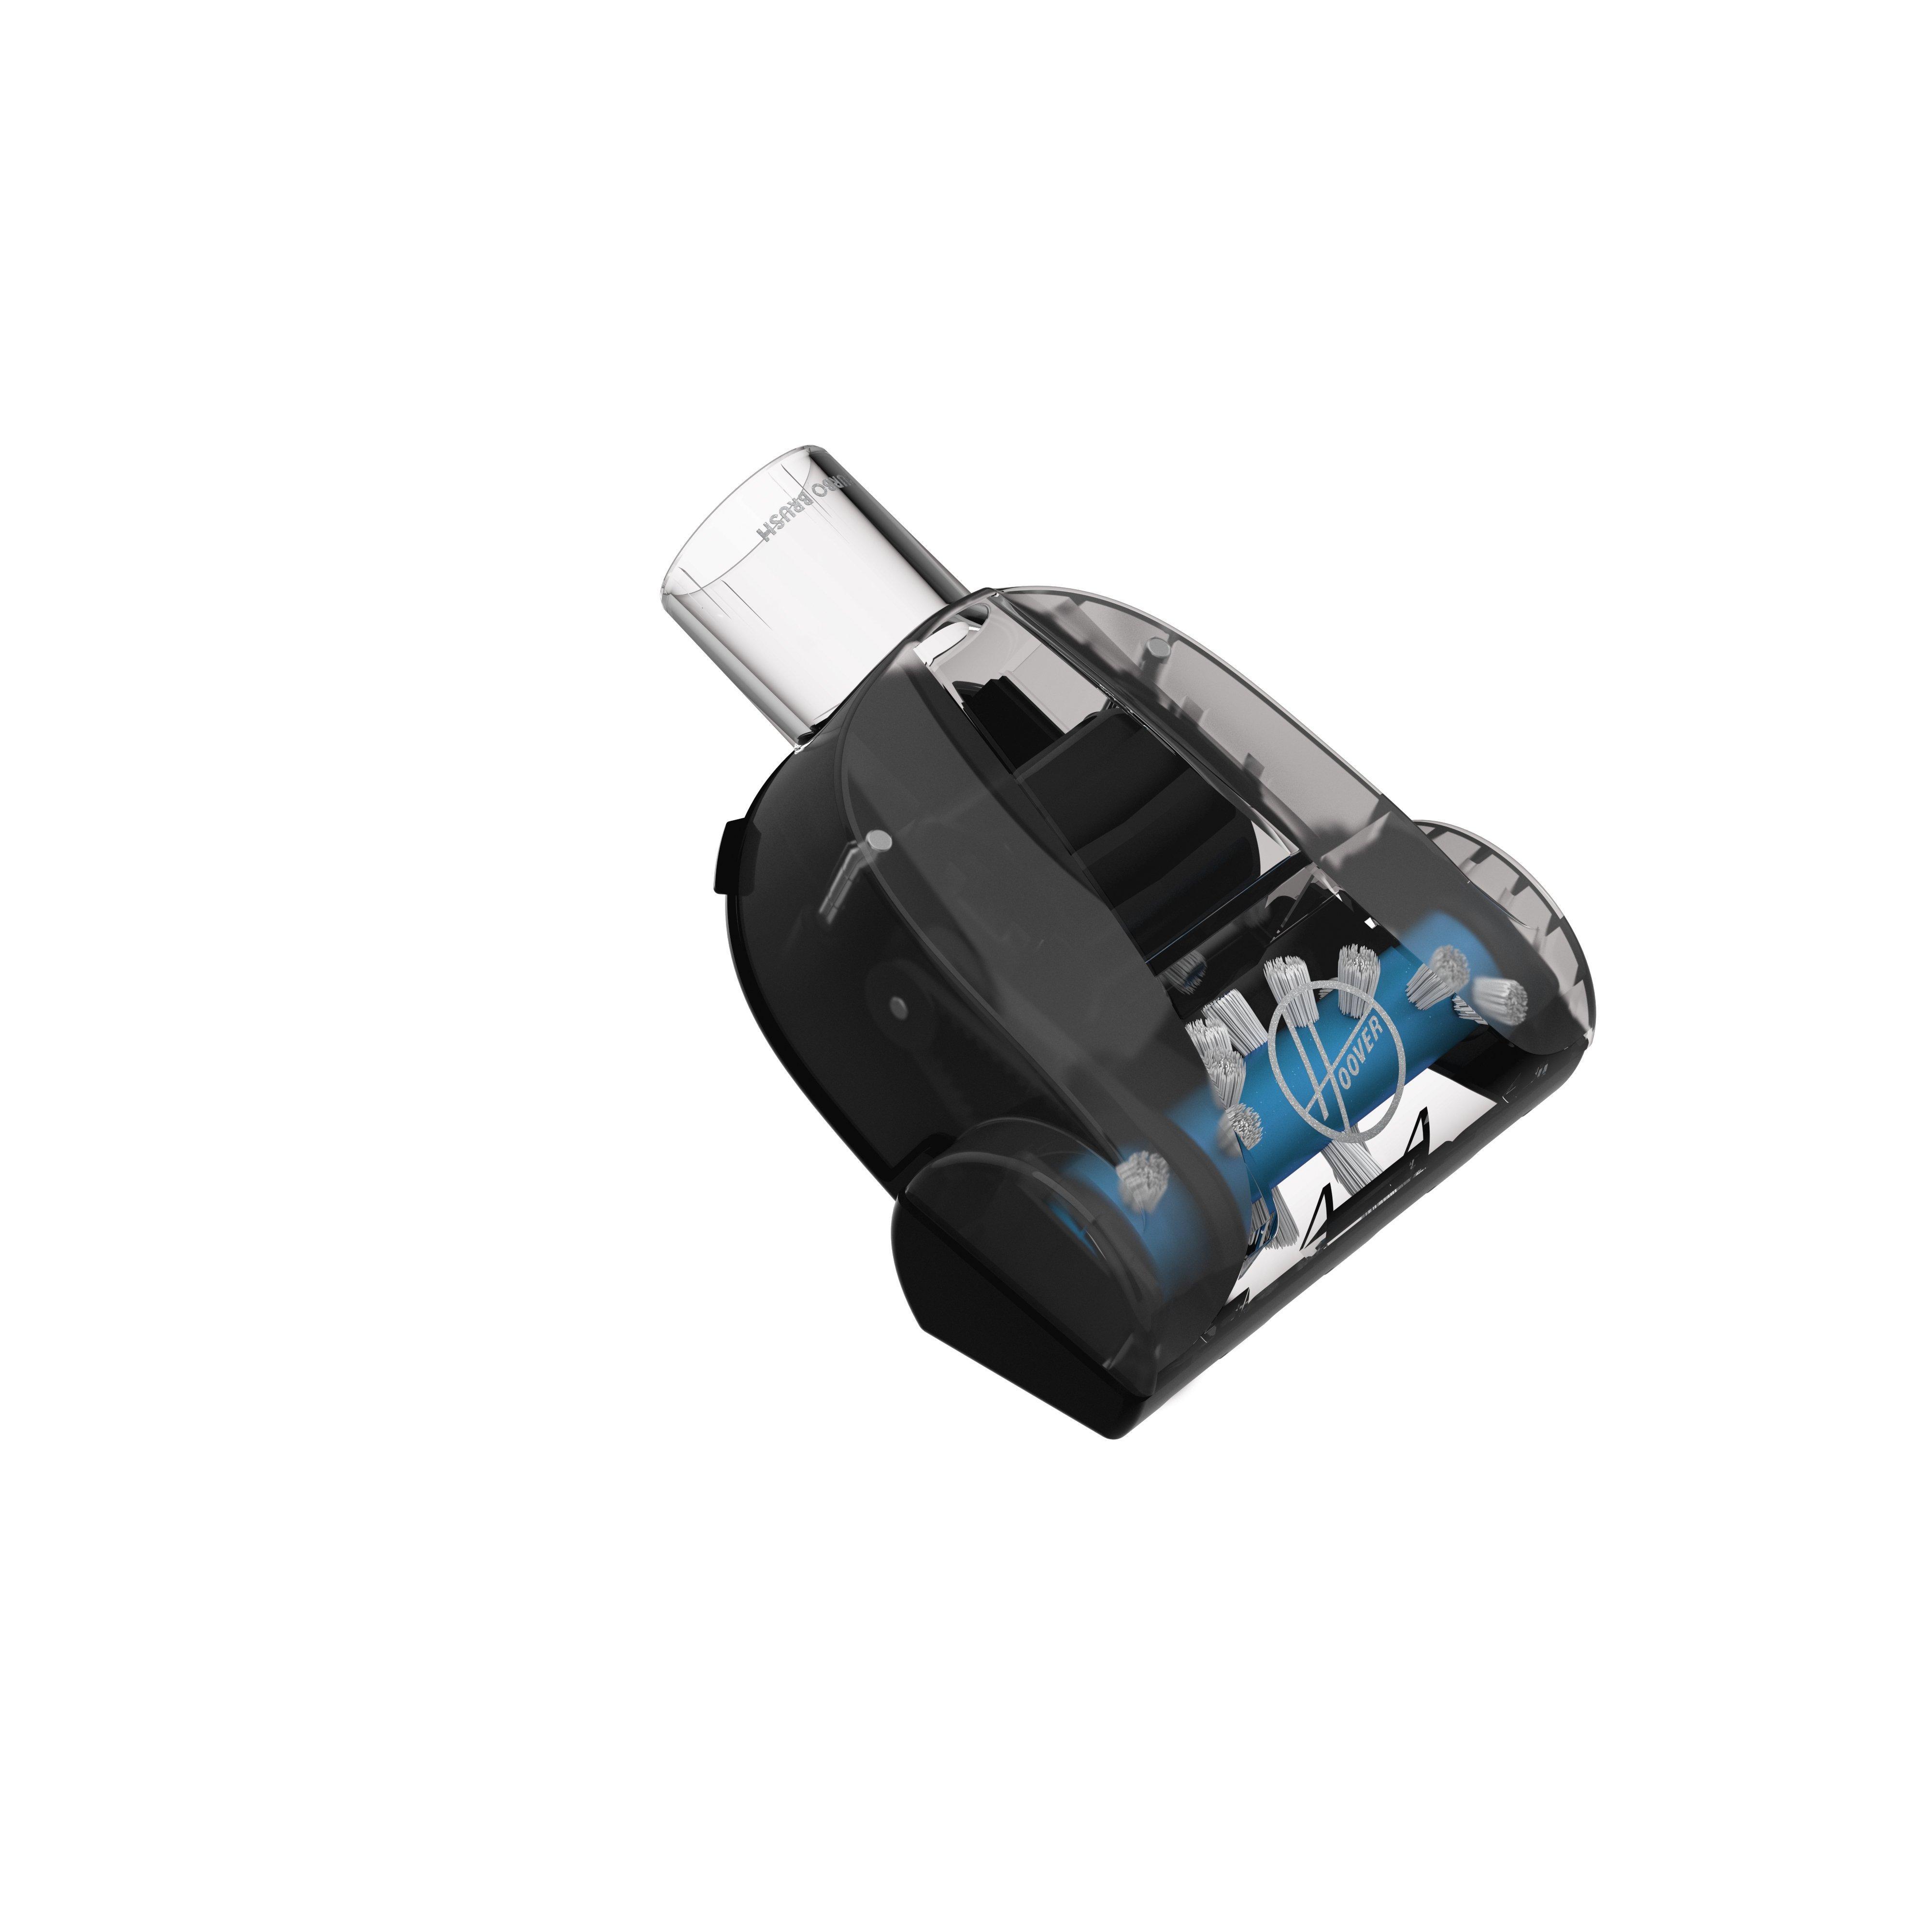 REACT Upright Vacuum8